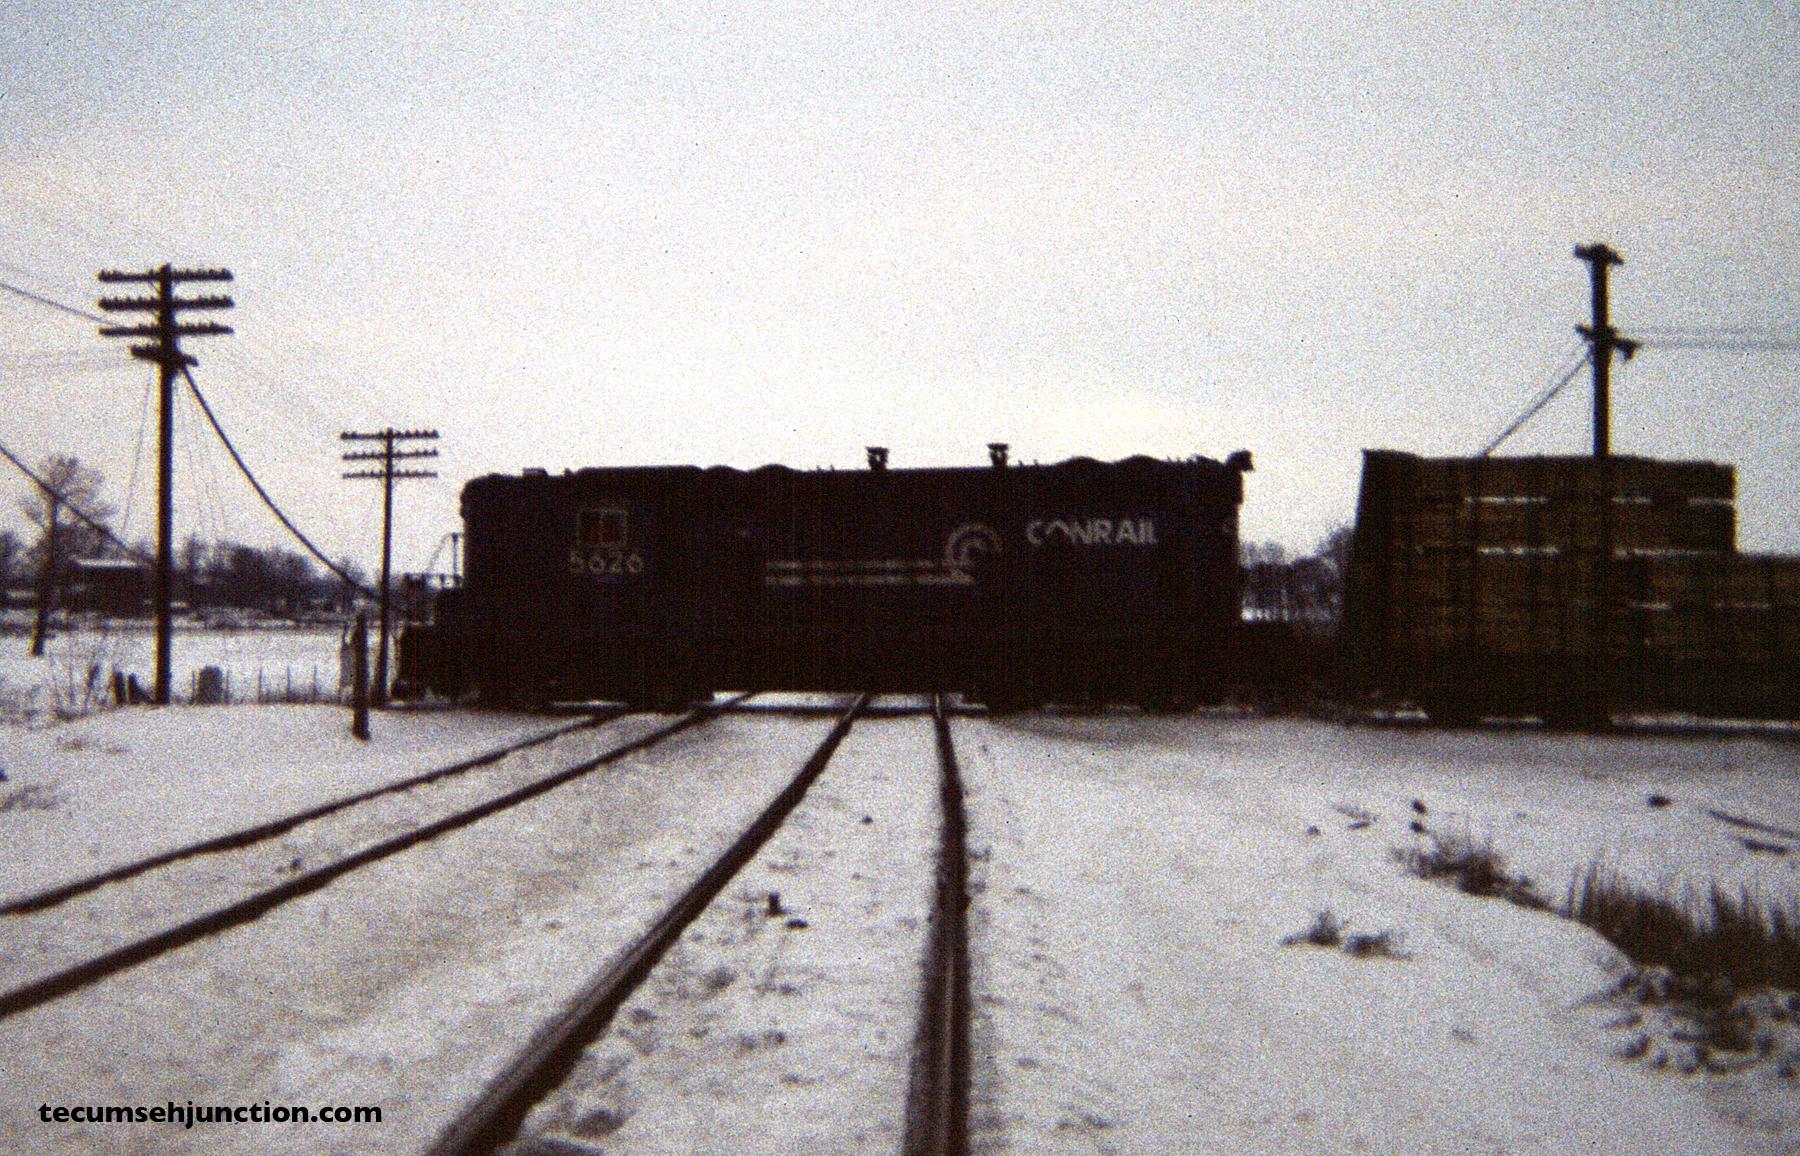 The northbound train crosses N&W diamonds at Raisin Center, Michigan. (12 December 1981)